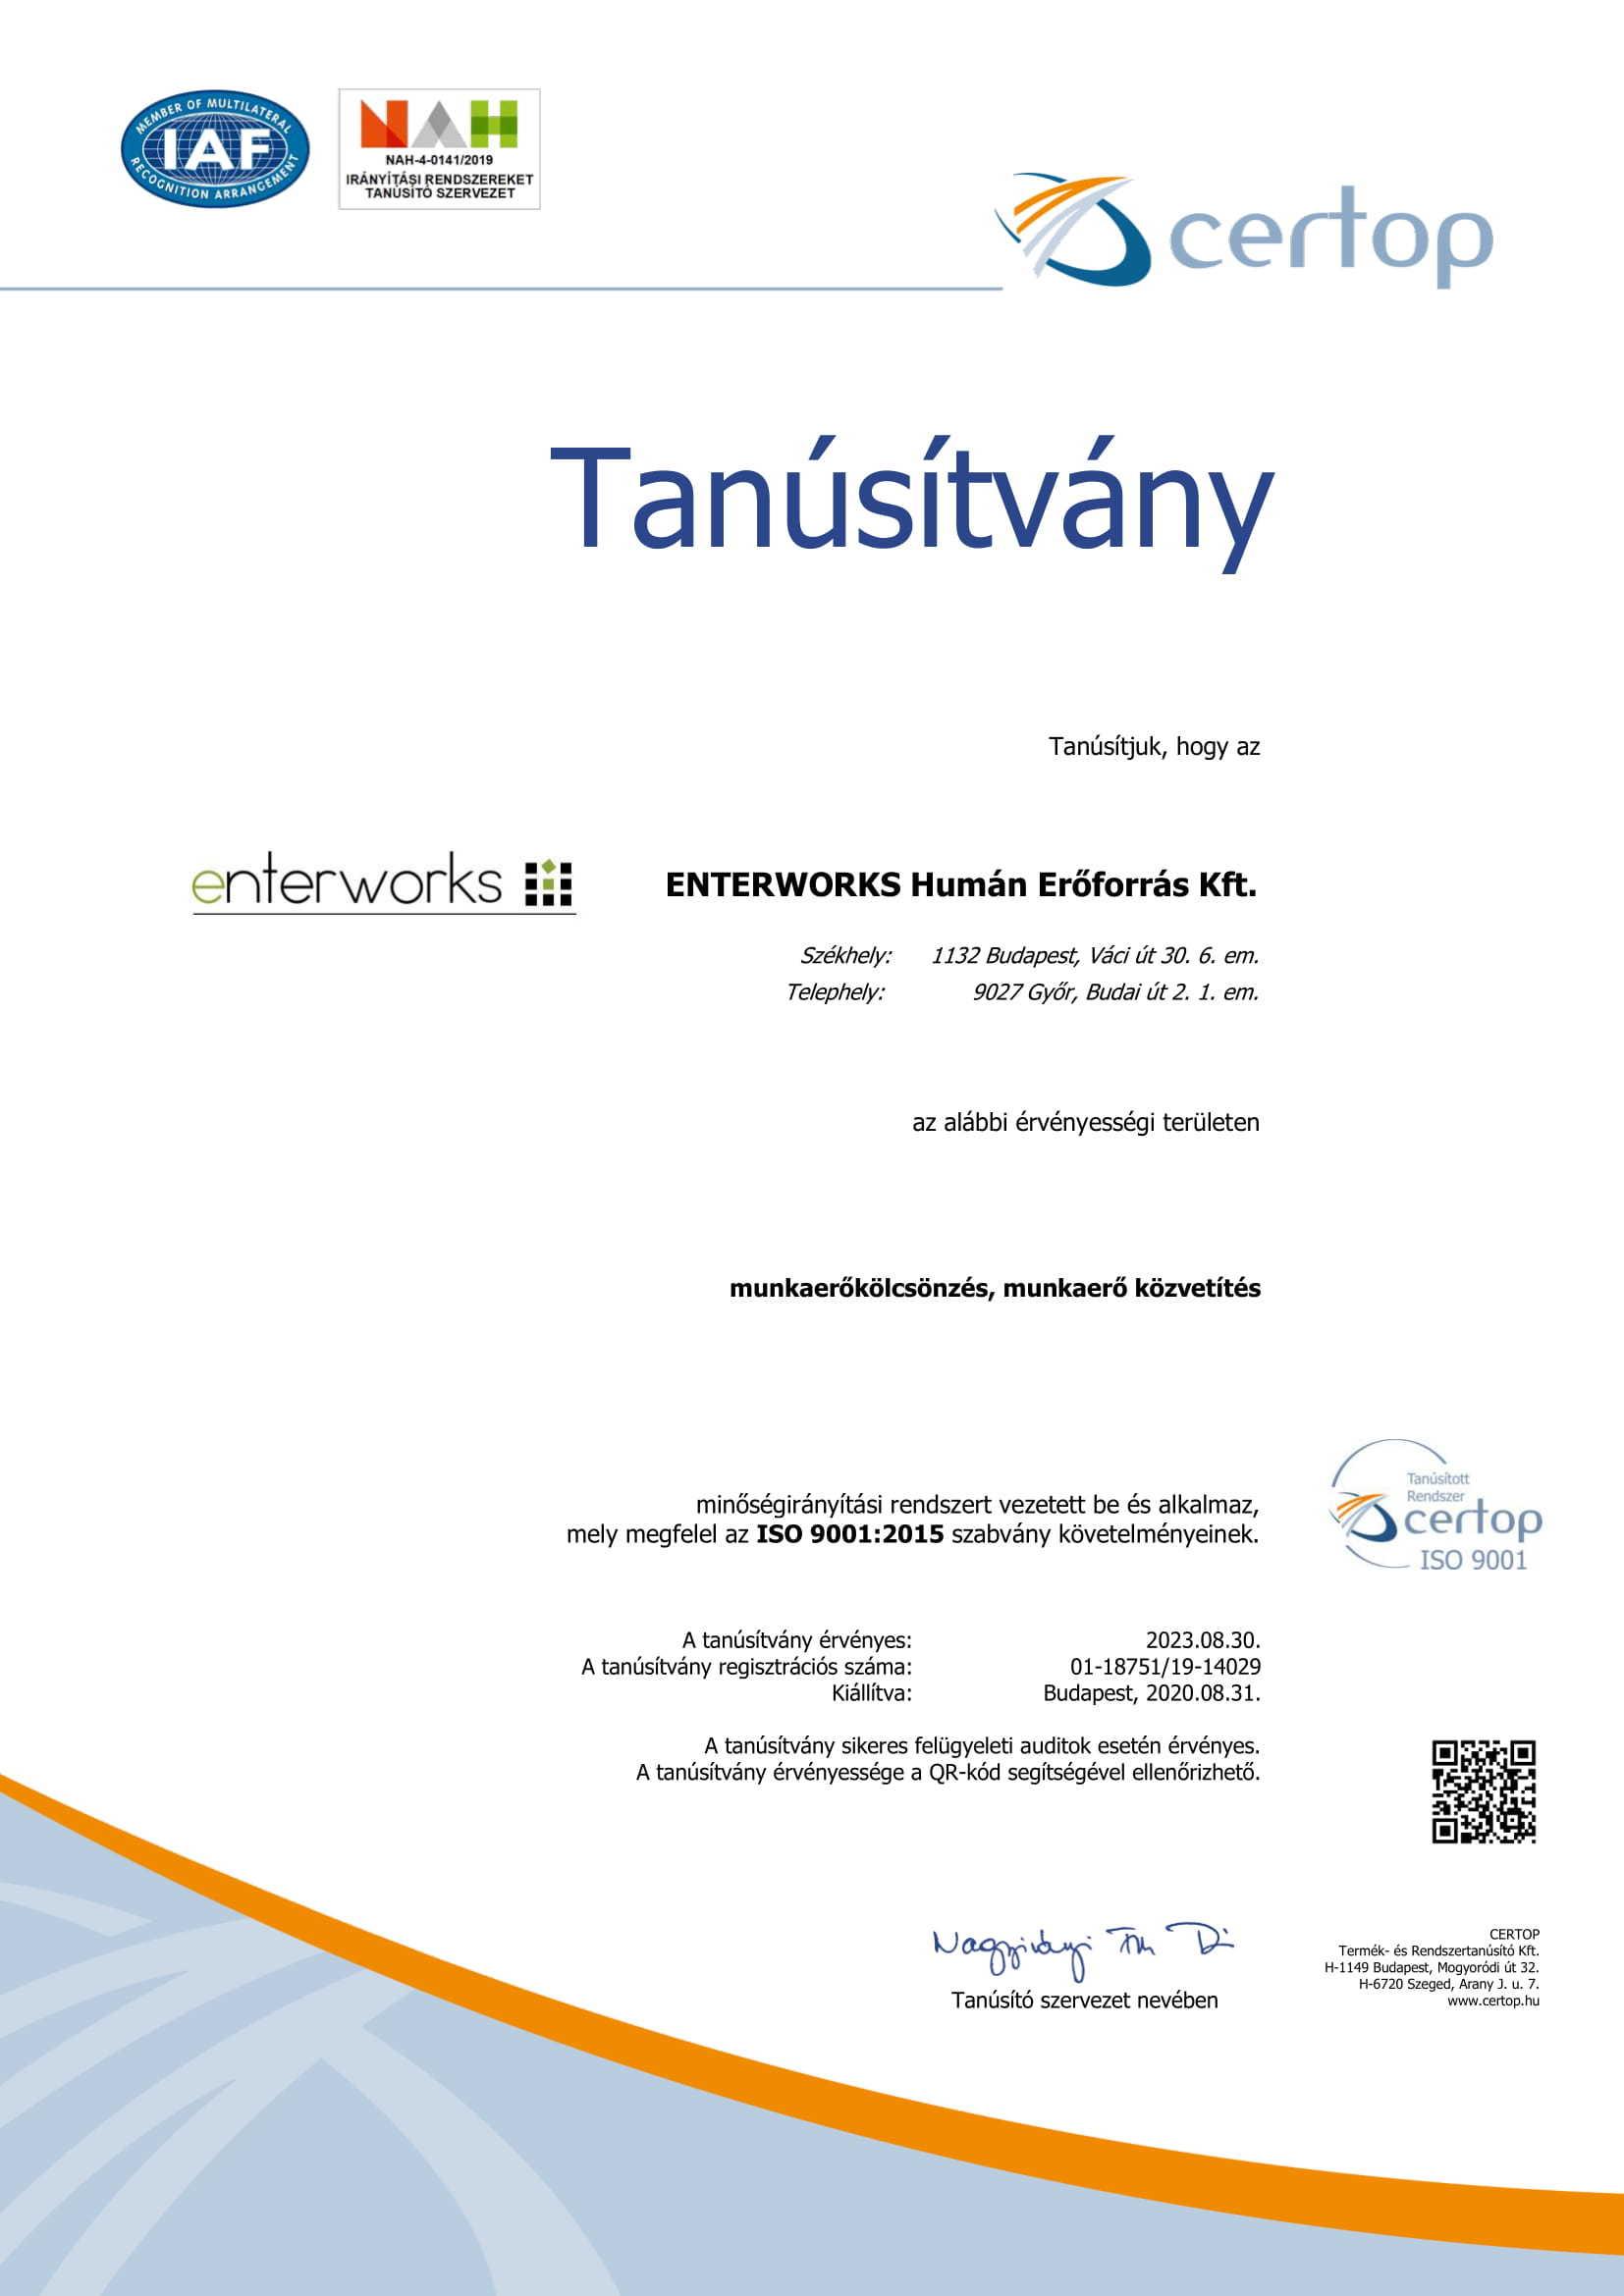 Tanusitvany HU18751 19 ISO 9001 2015 magyar 2020 08 31 1